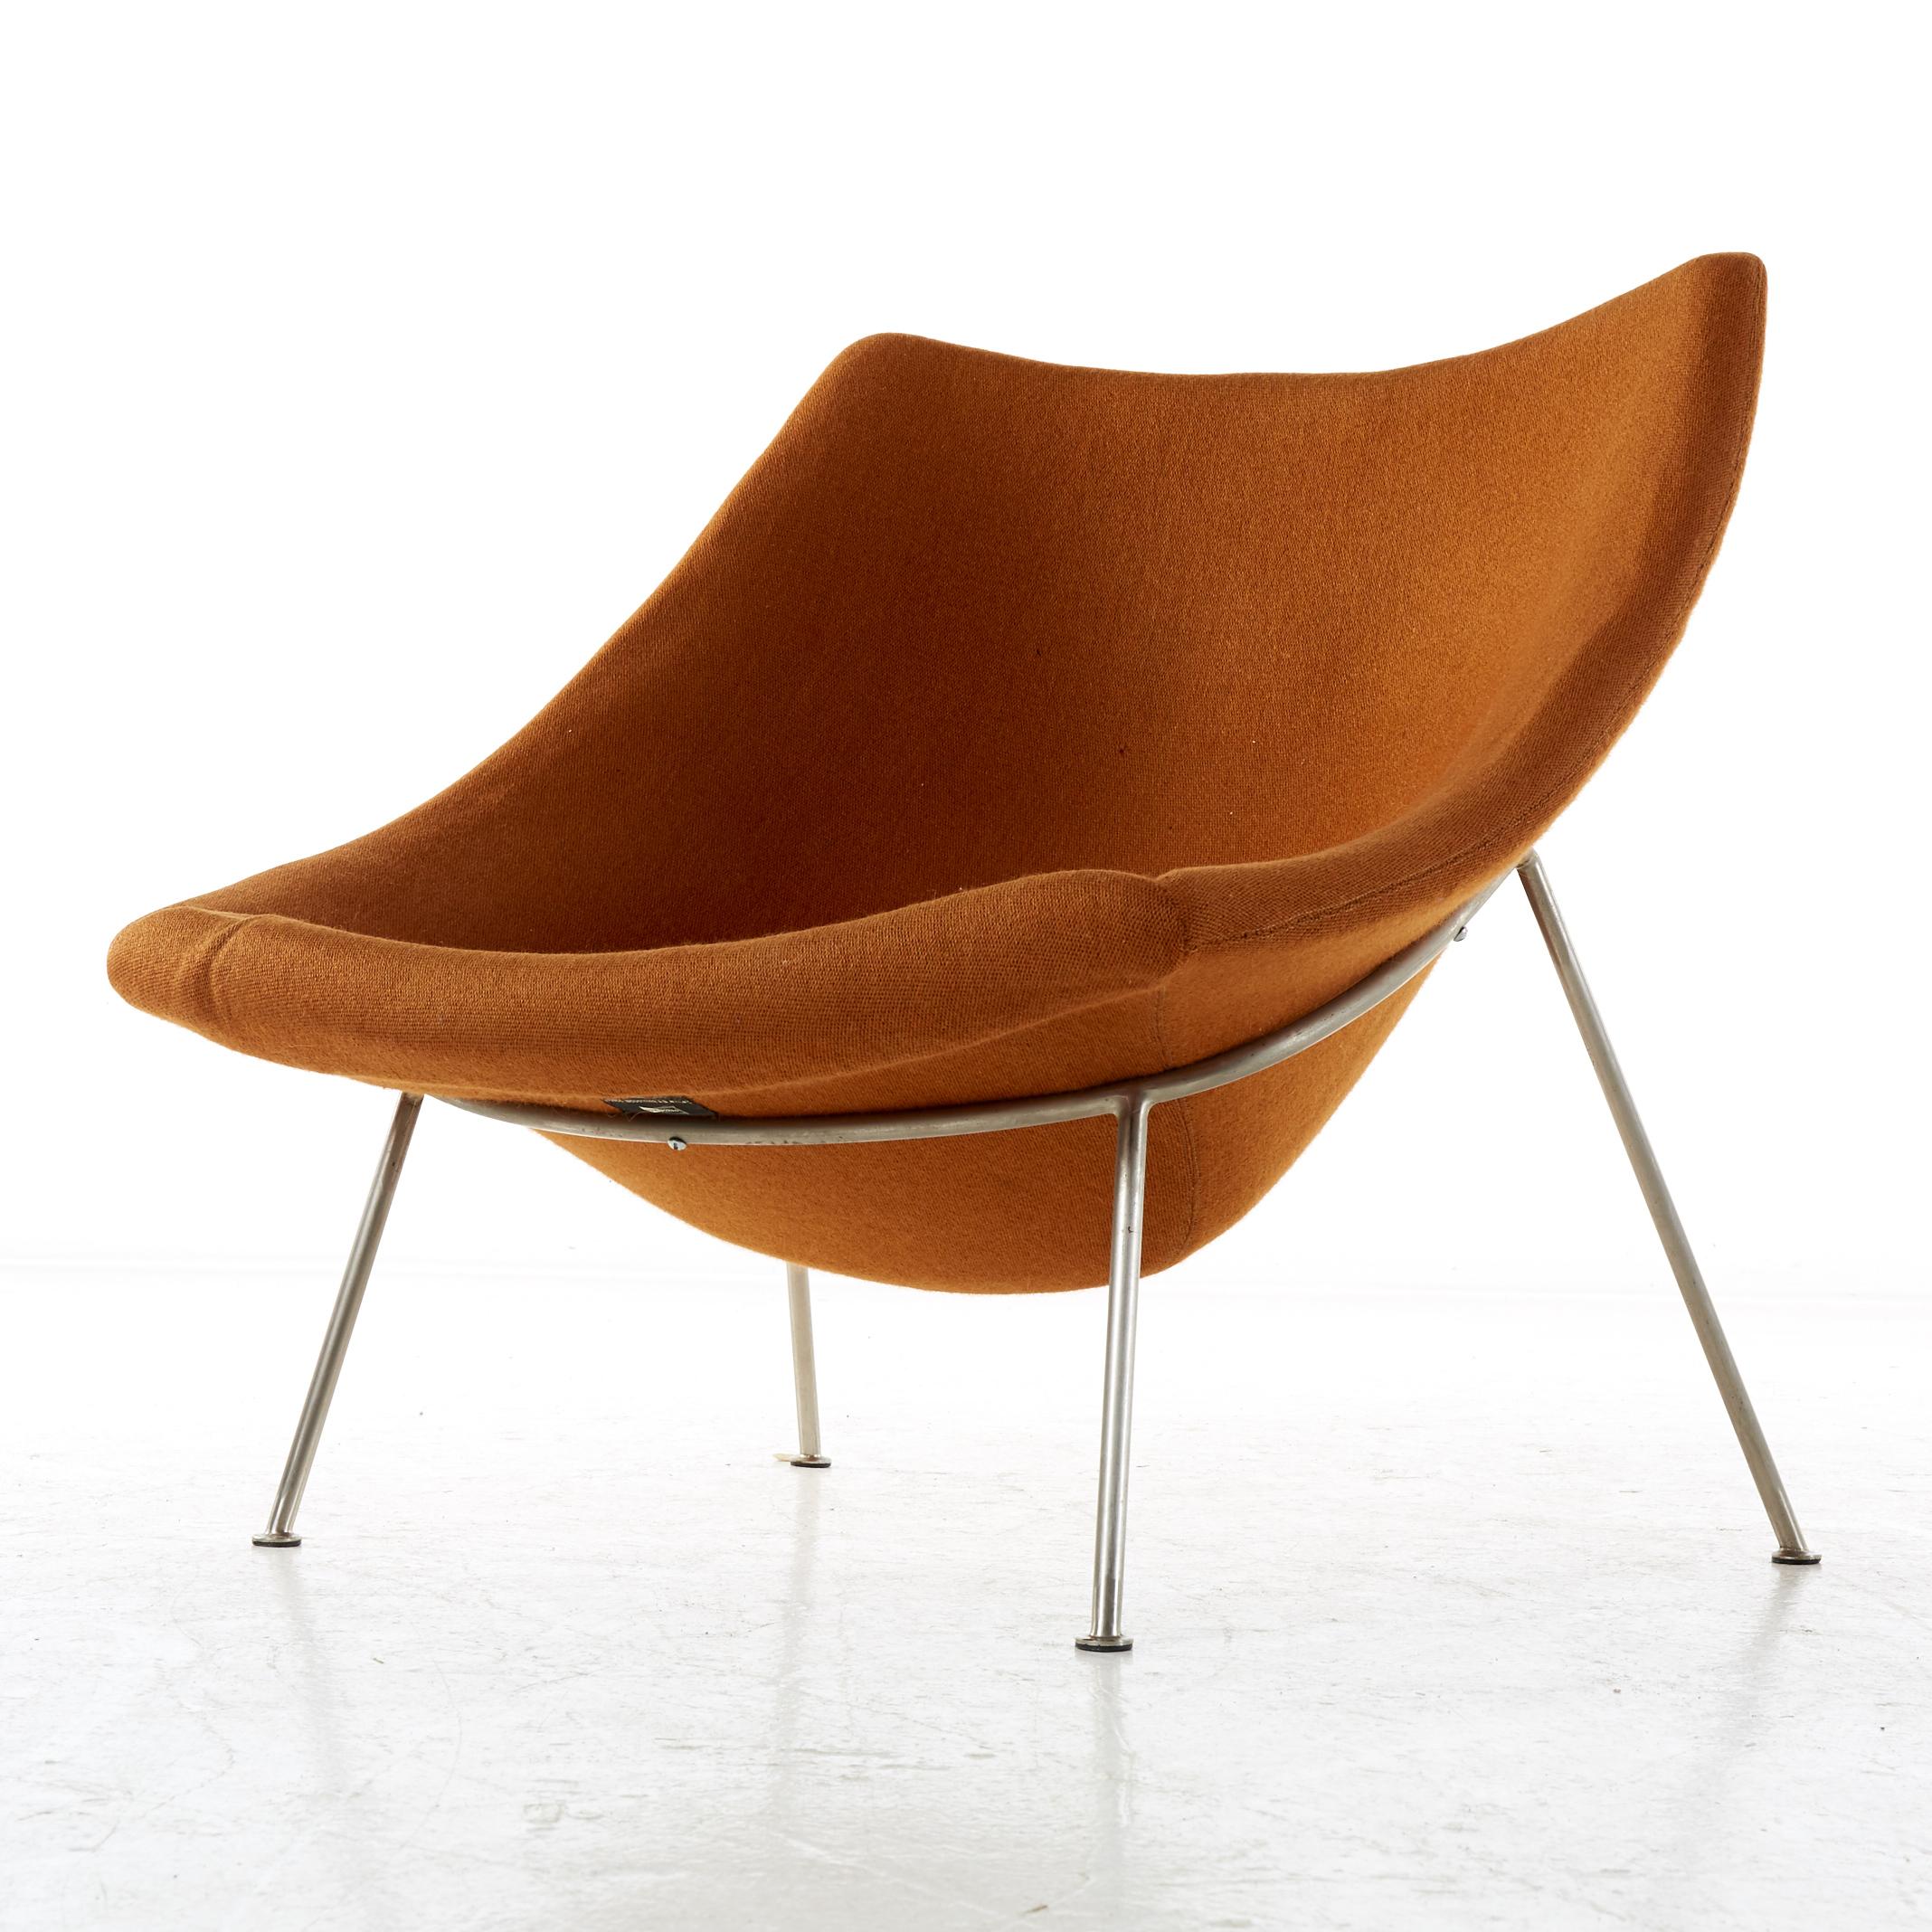 Layered fåtölj orange Stockholms Auktionsverk Barnebys